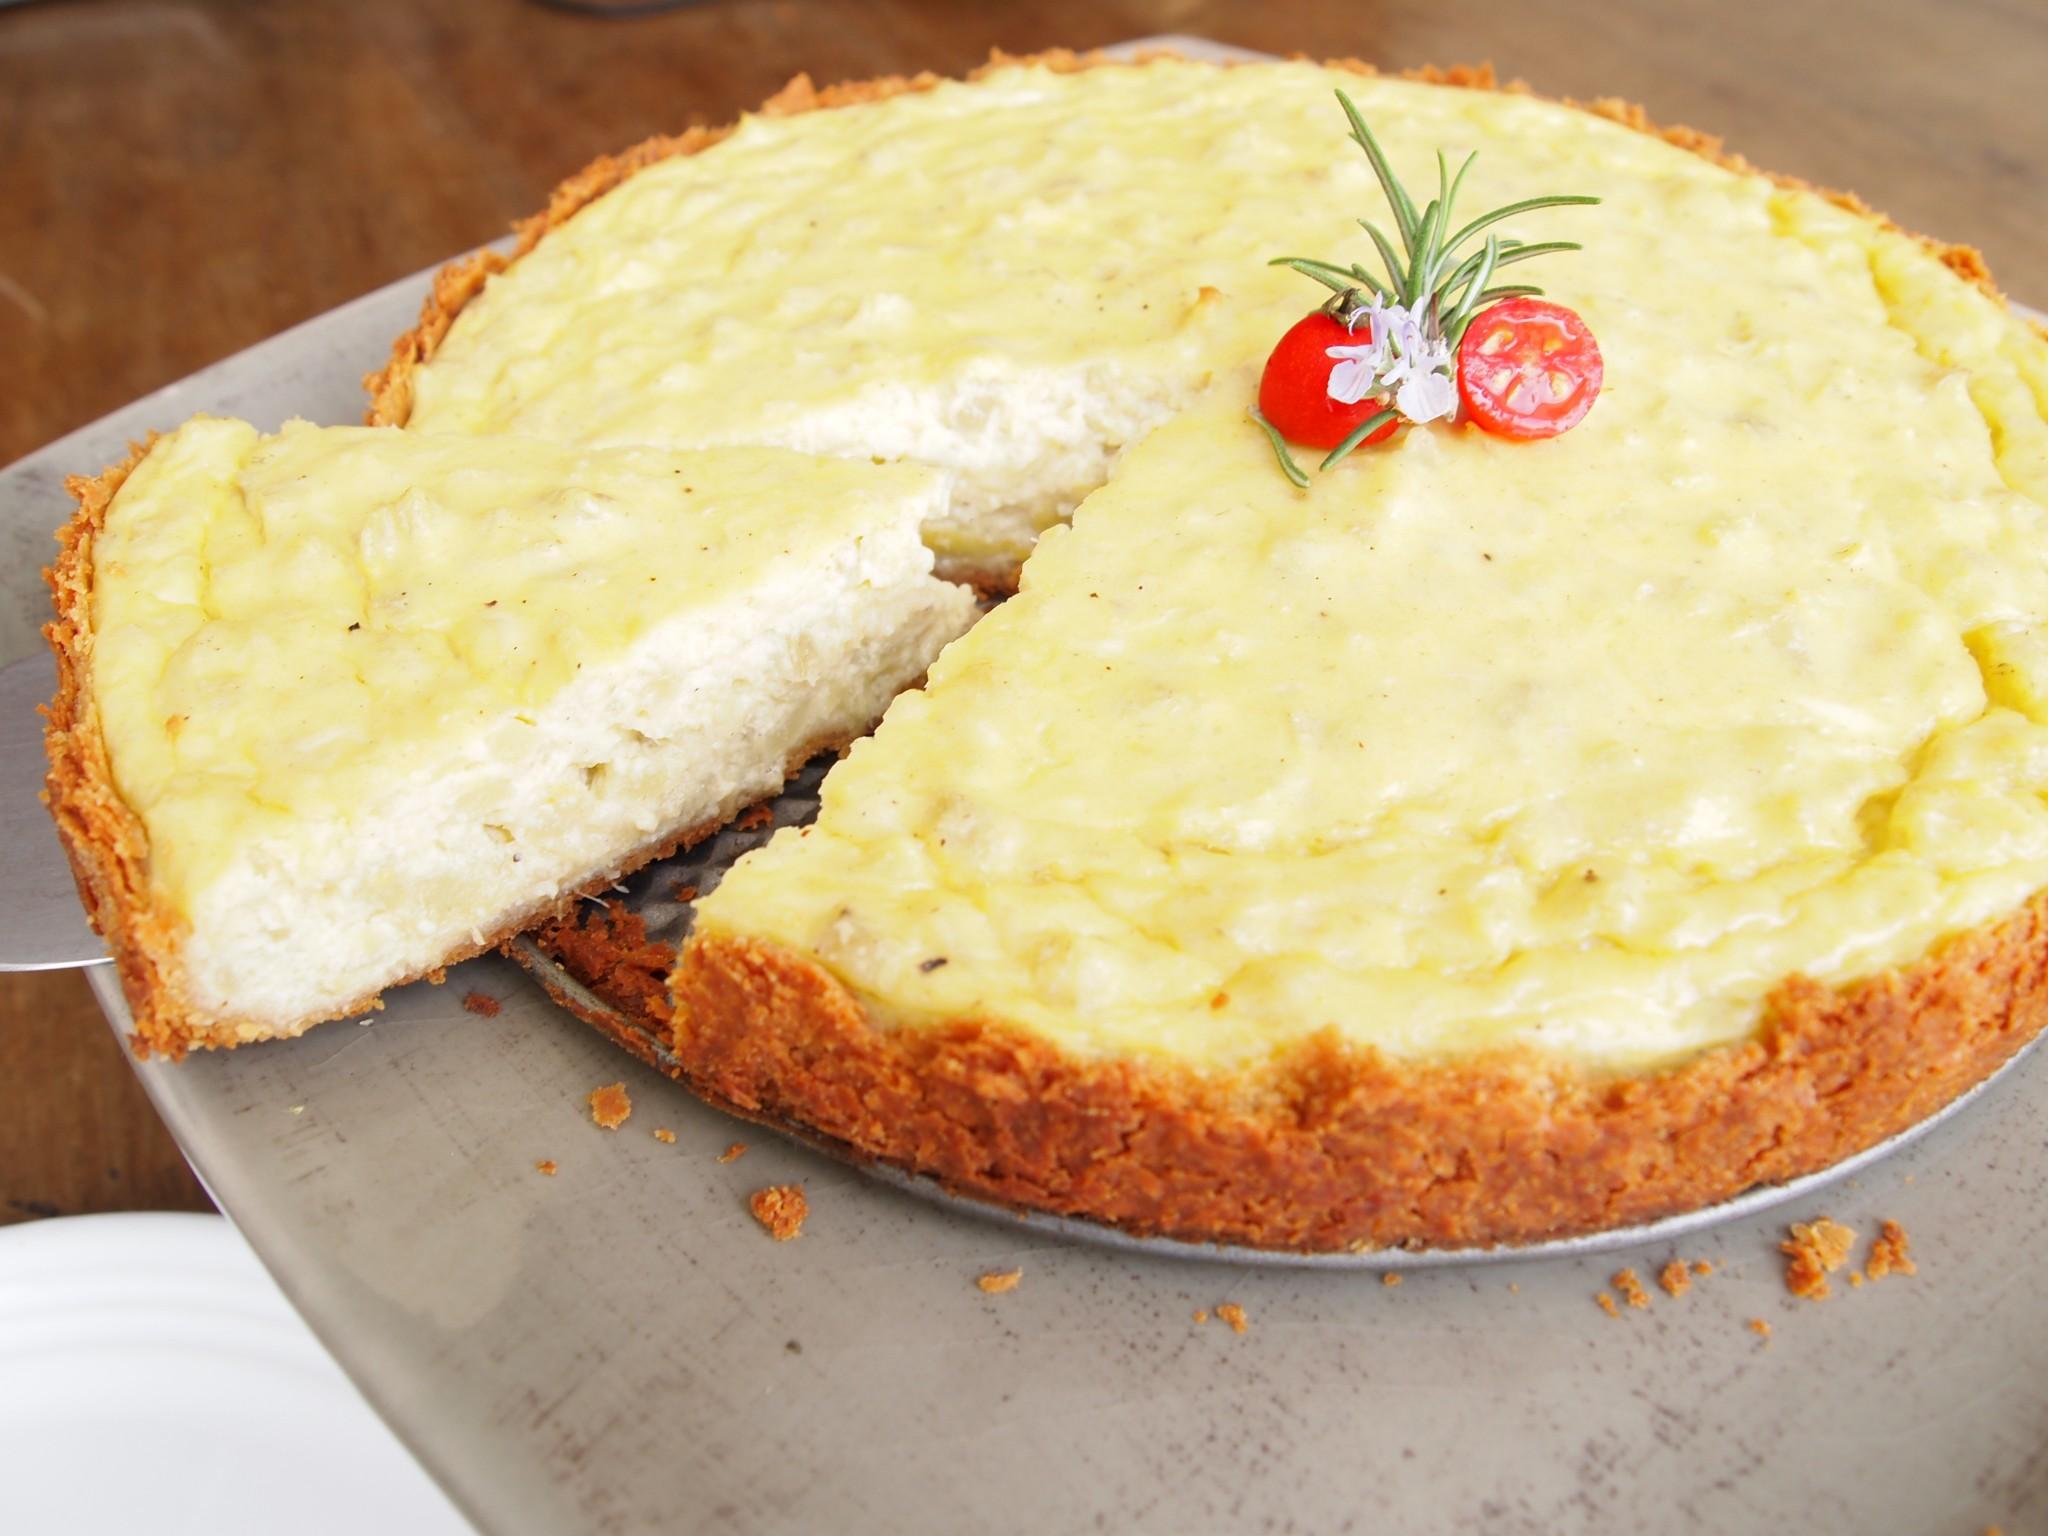 Artichoke Tart - Pastel de Alcachofas